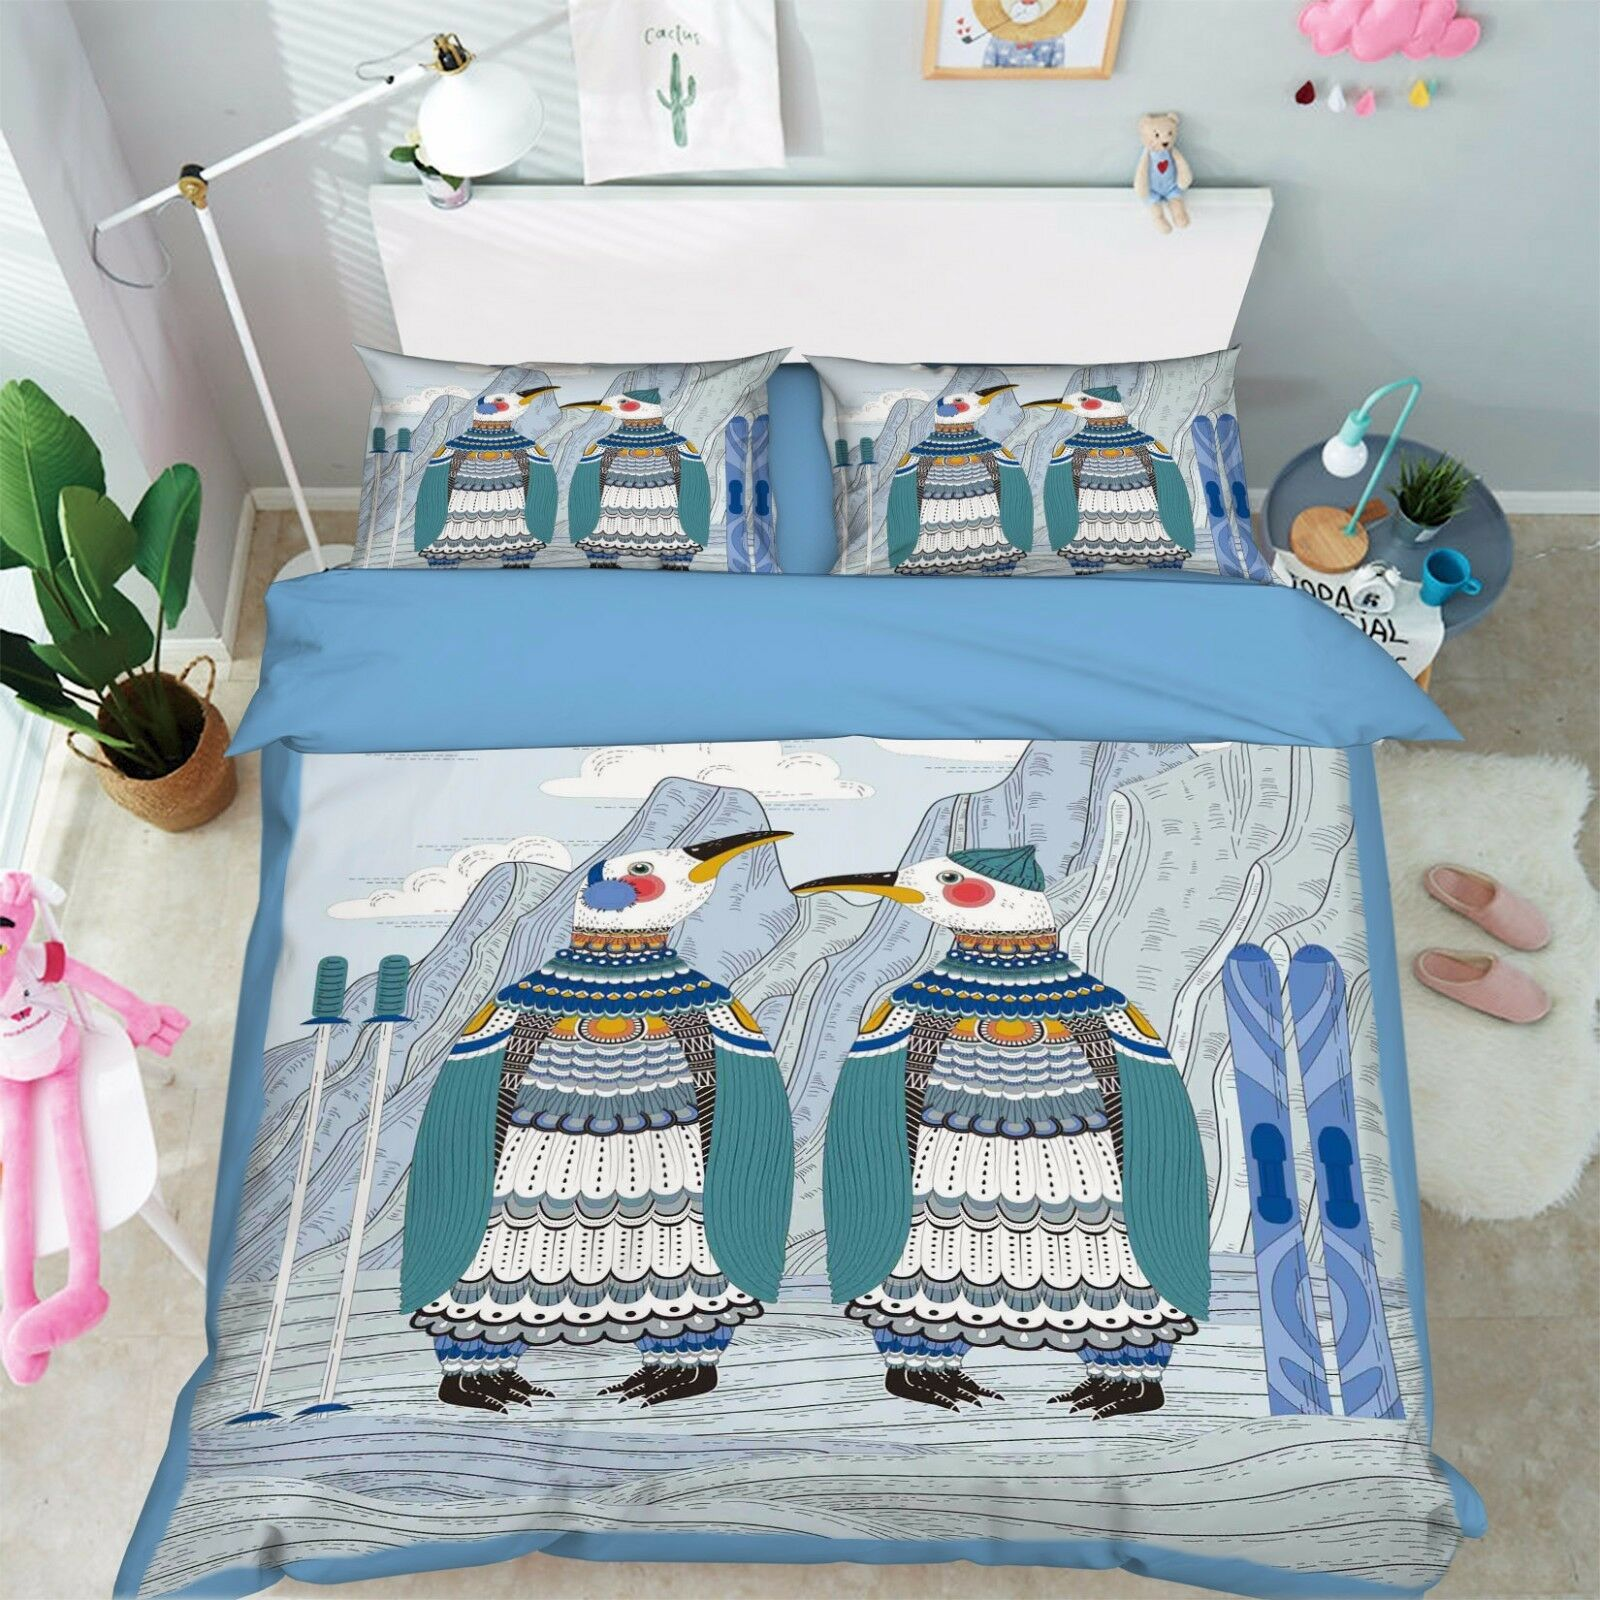 3D Ethnic Style Penguin 52 Bed Pillowcases Quilt Duvet Cover Set Single Queen CA